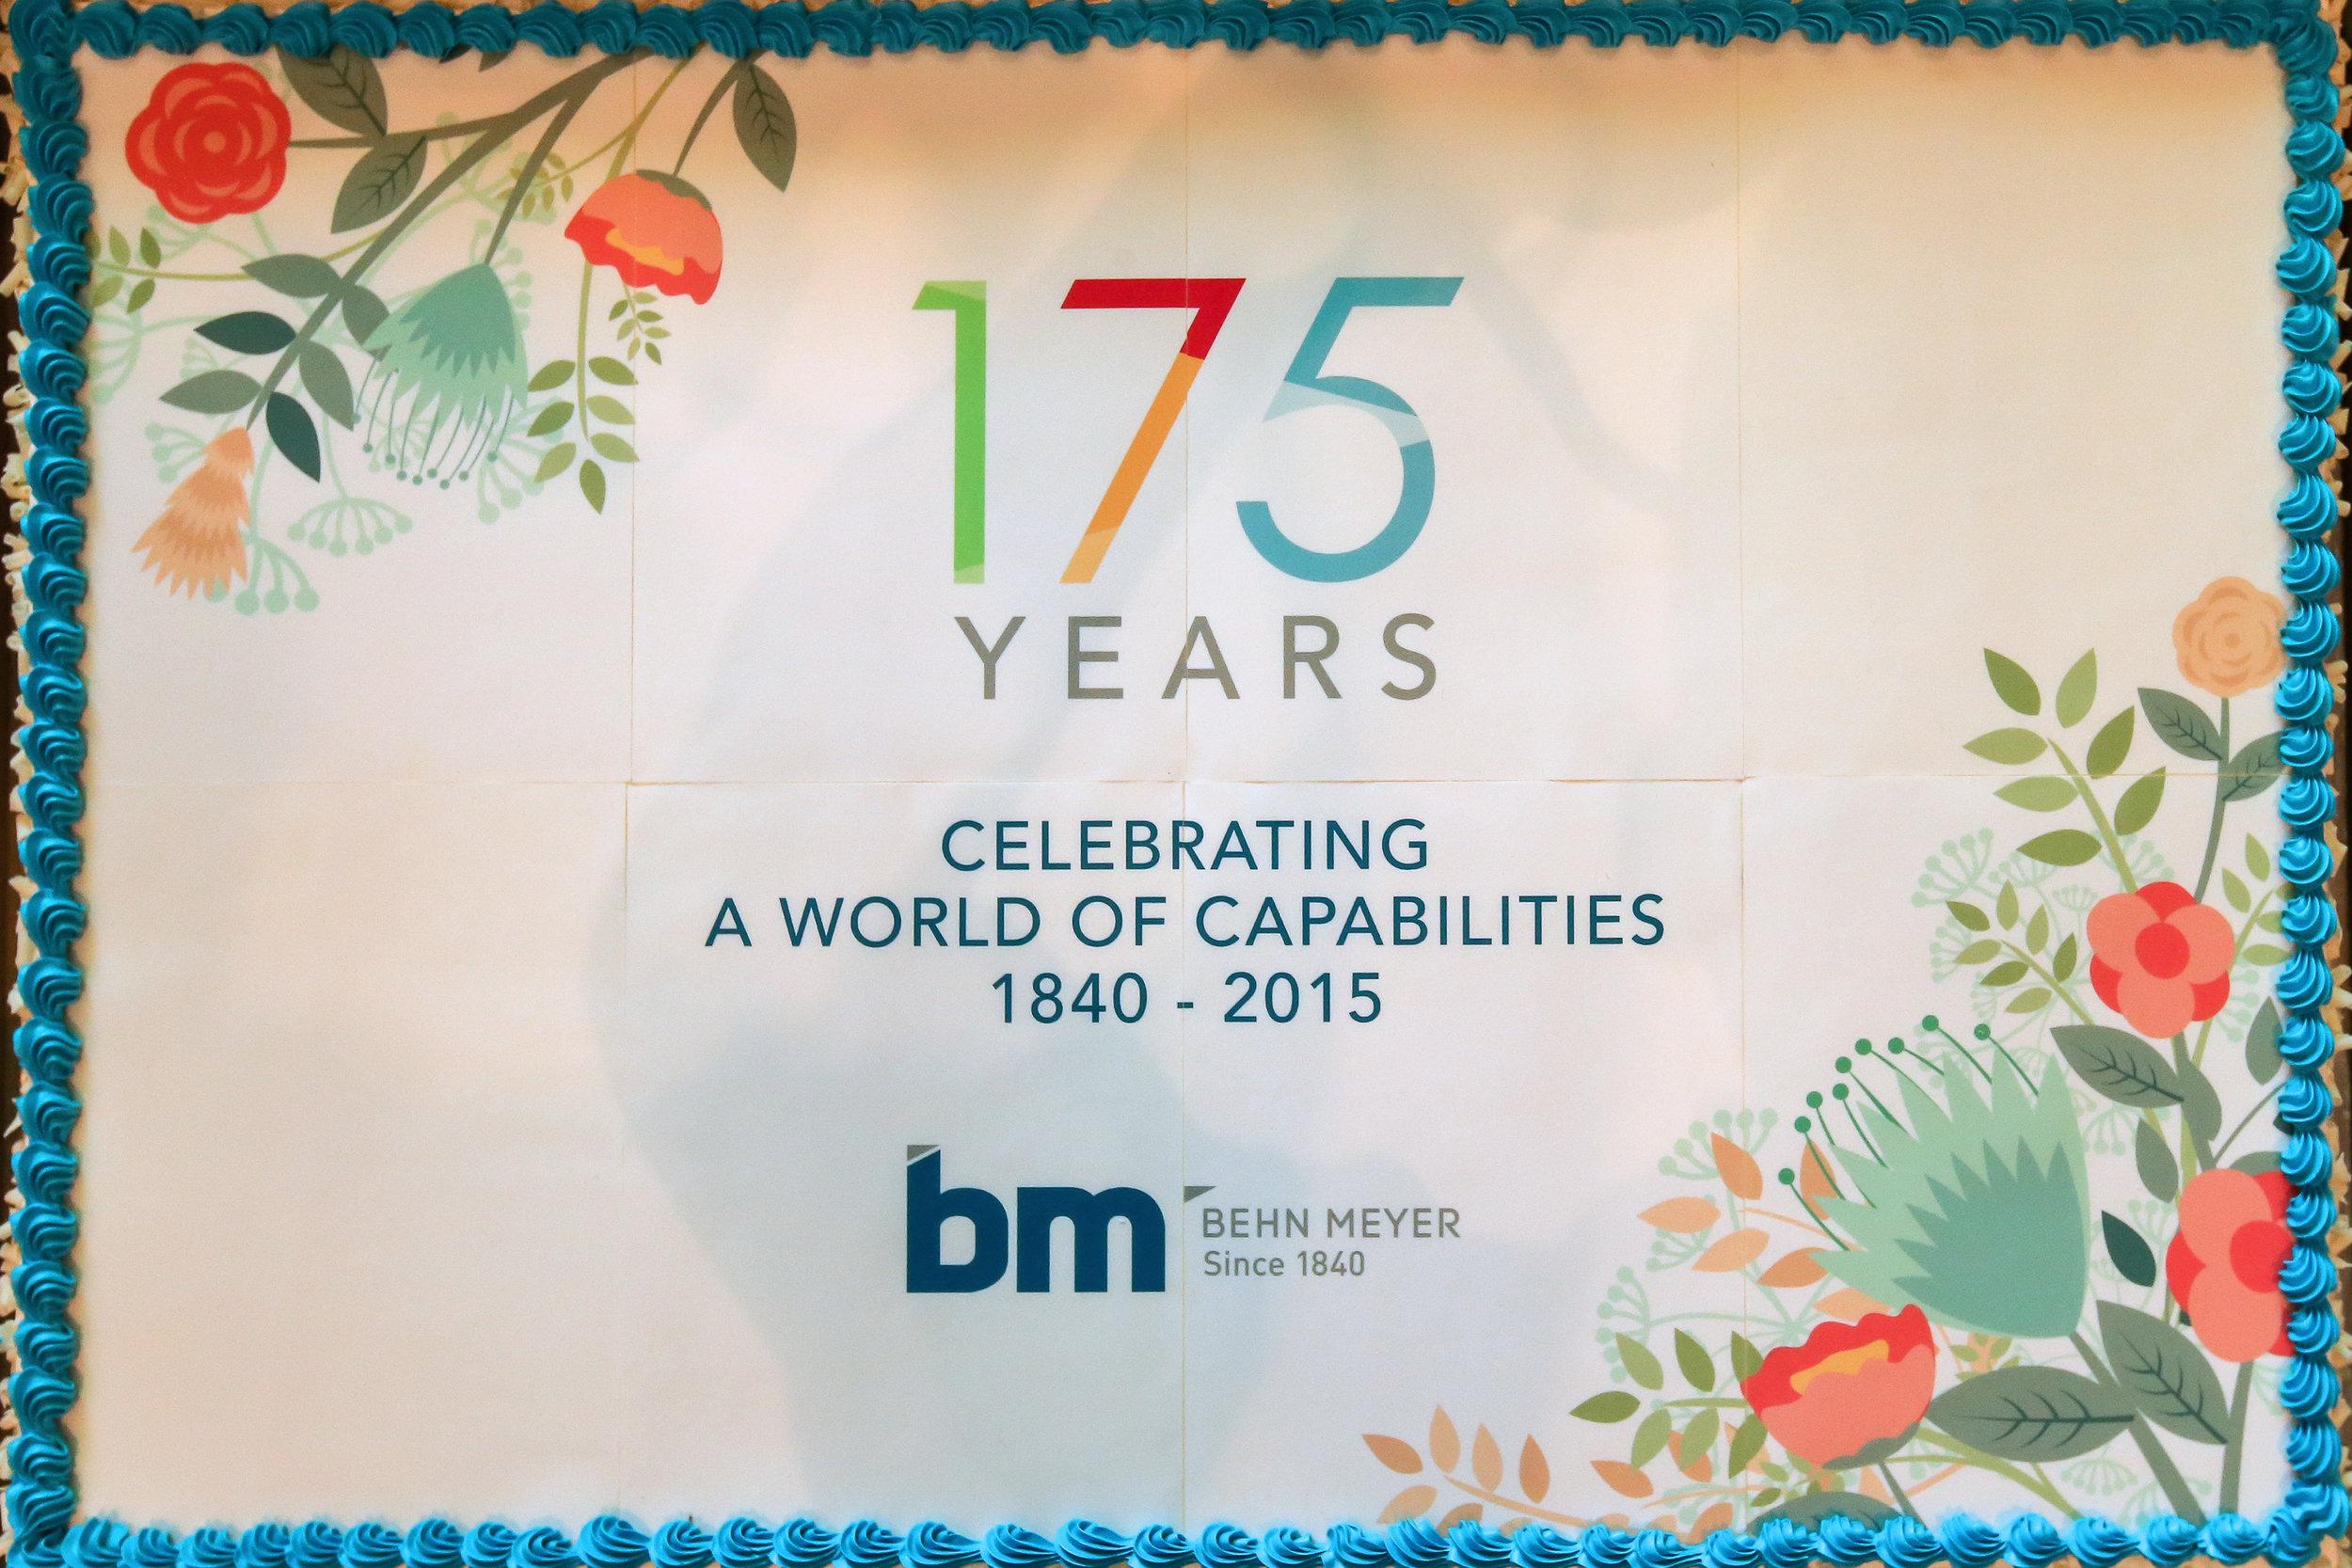 performance-additives-behn-meyer-175th-anniversary-cake.jpg